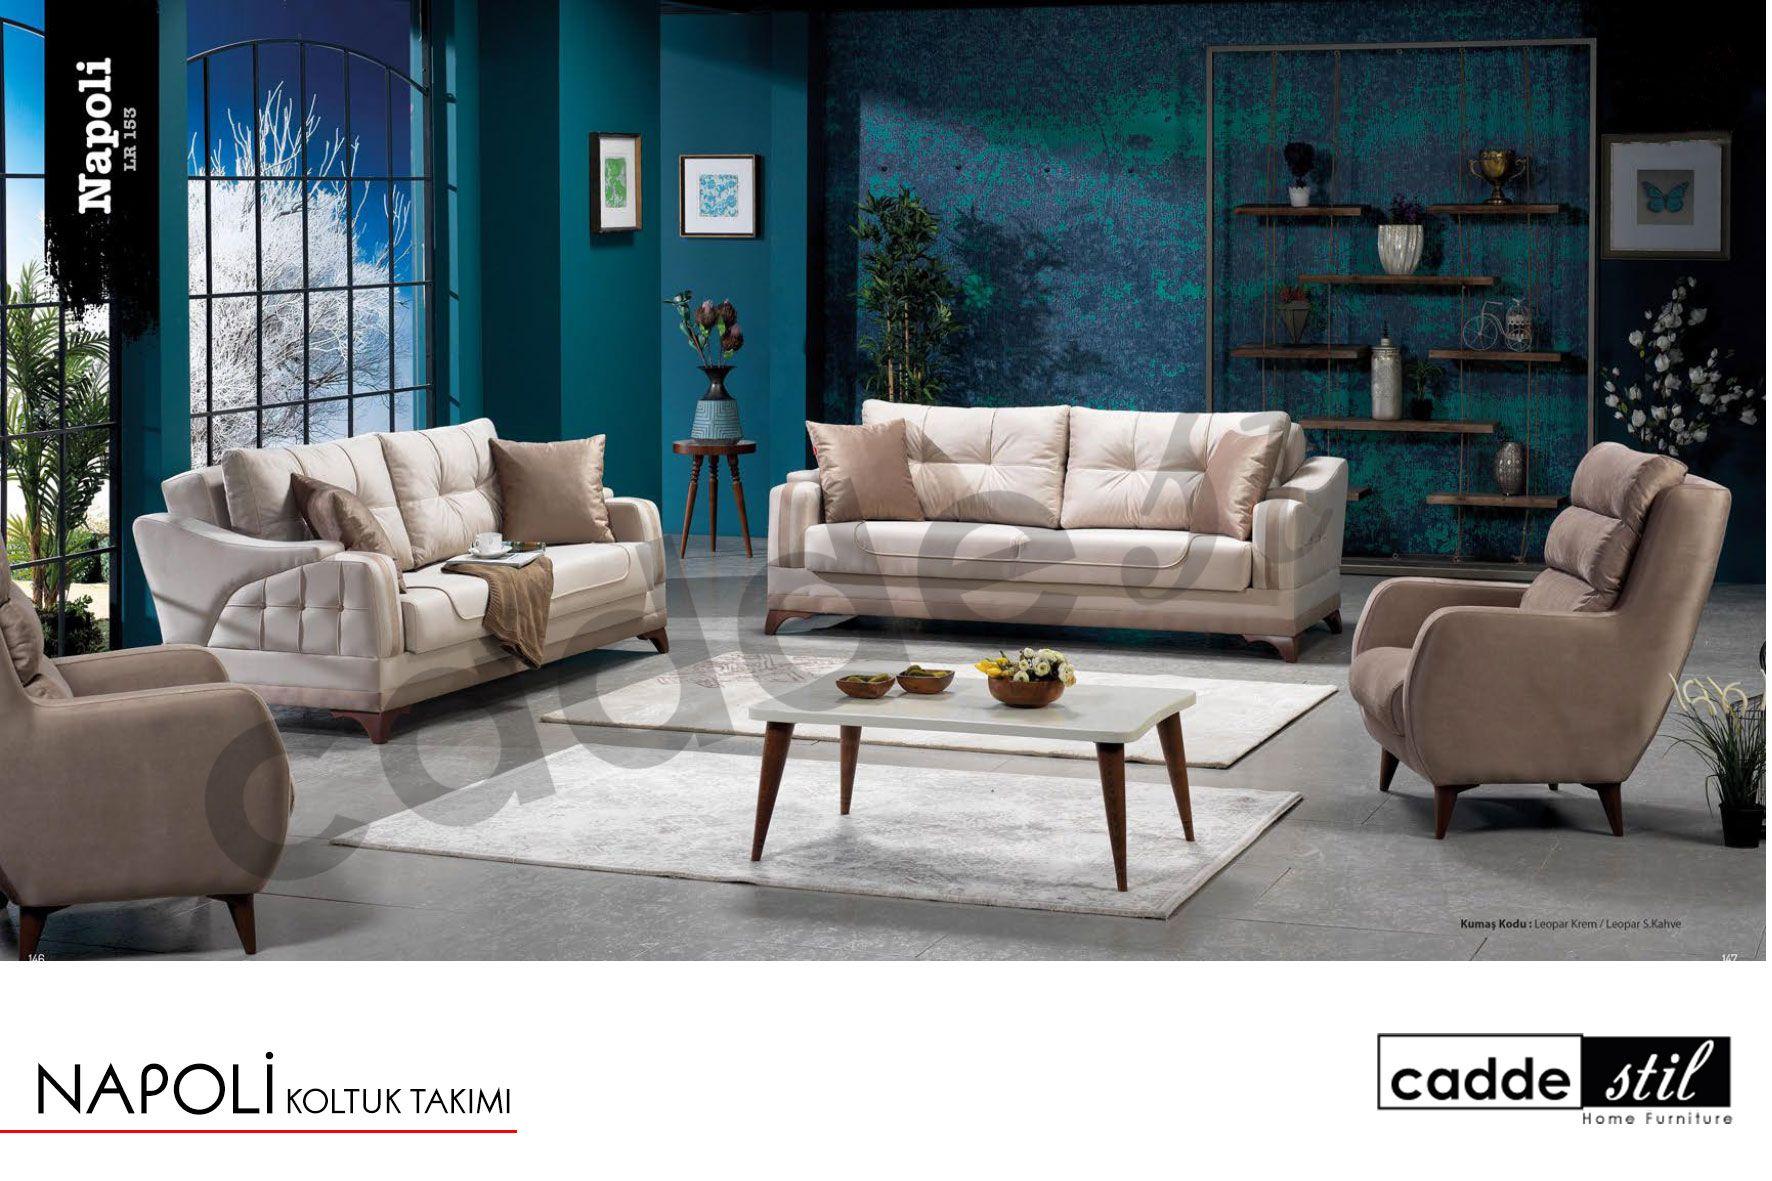 Koltuk Takimlari 2020 Furniture Koltuklar Yemek Odasi Takimlari